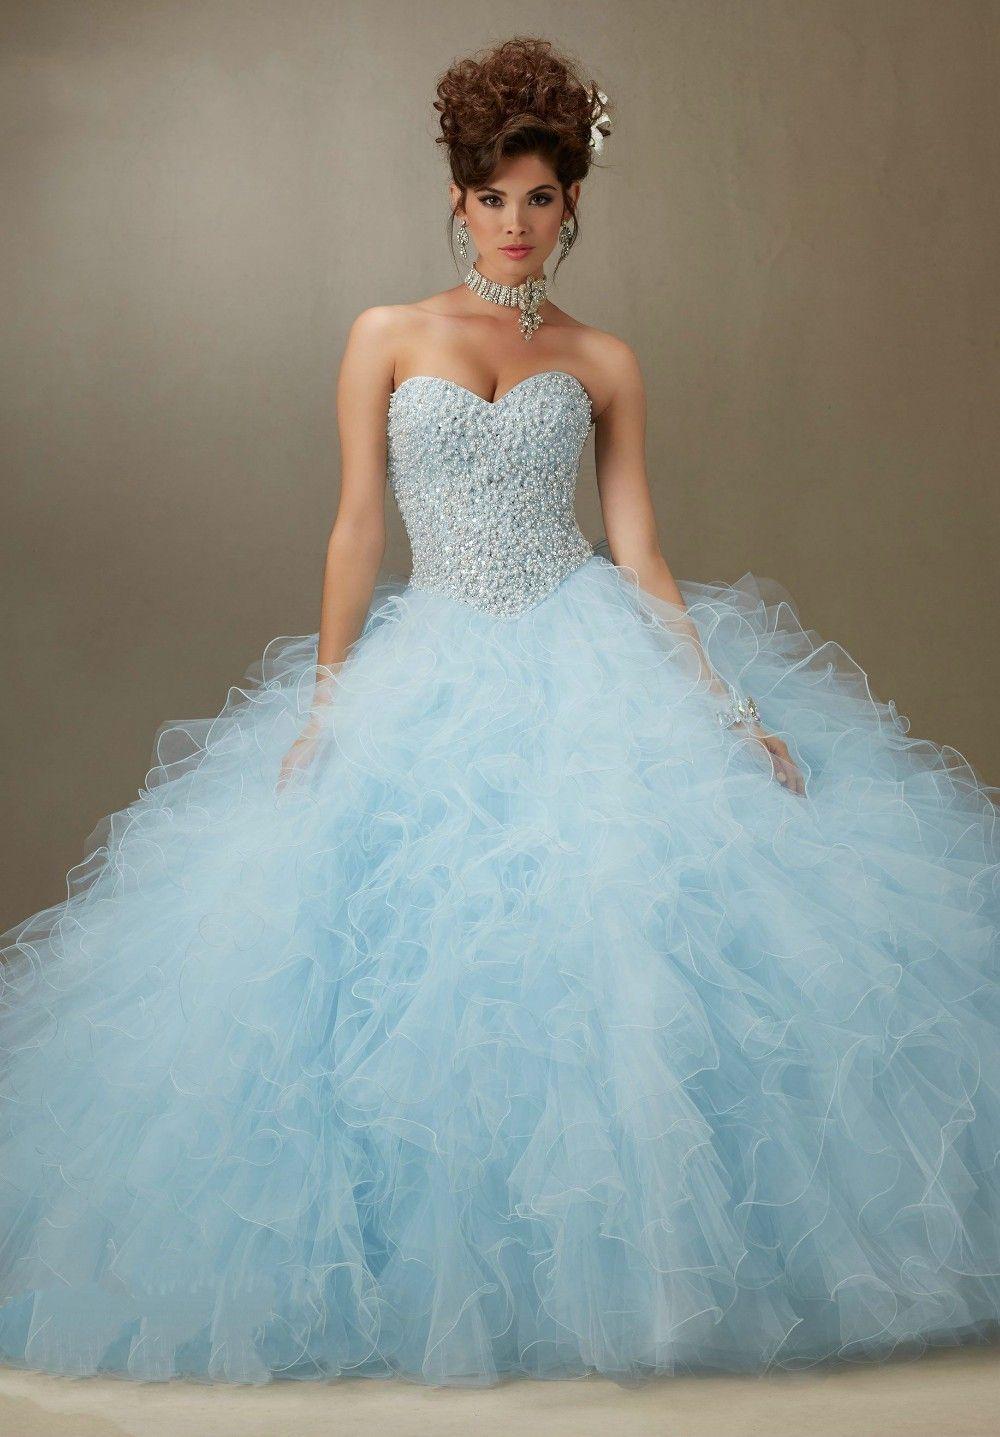 corpete azul claro   Glacê   Pinterest   Quinceanera dresses 2016 ...